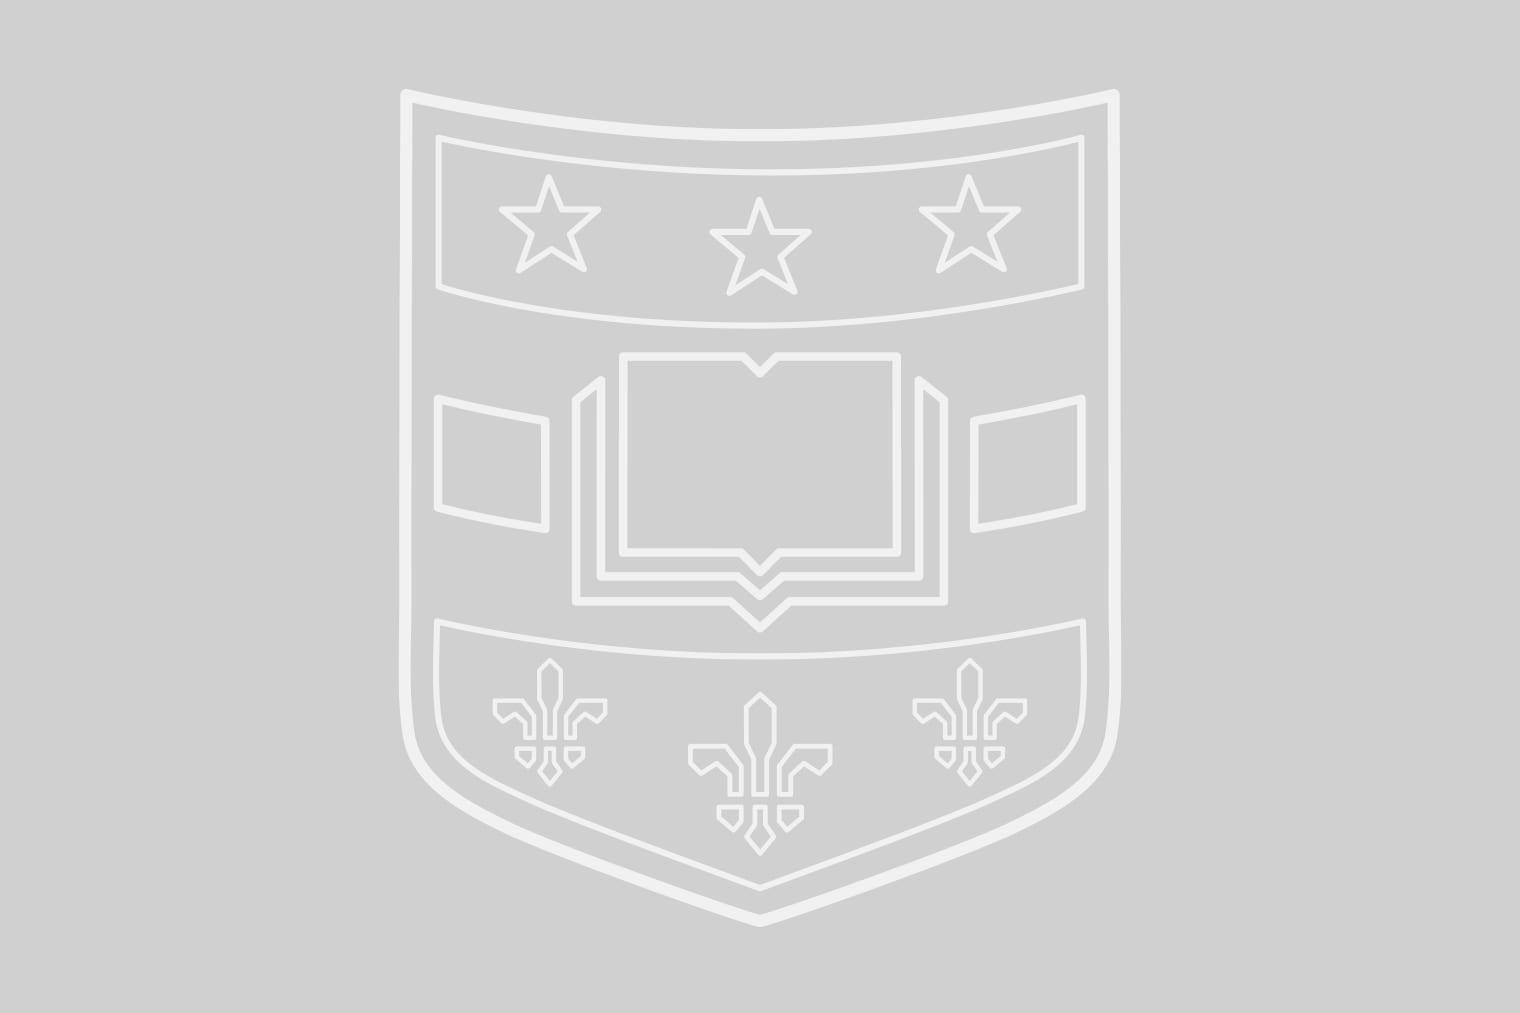 WashU shield logo